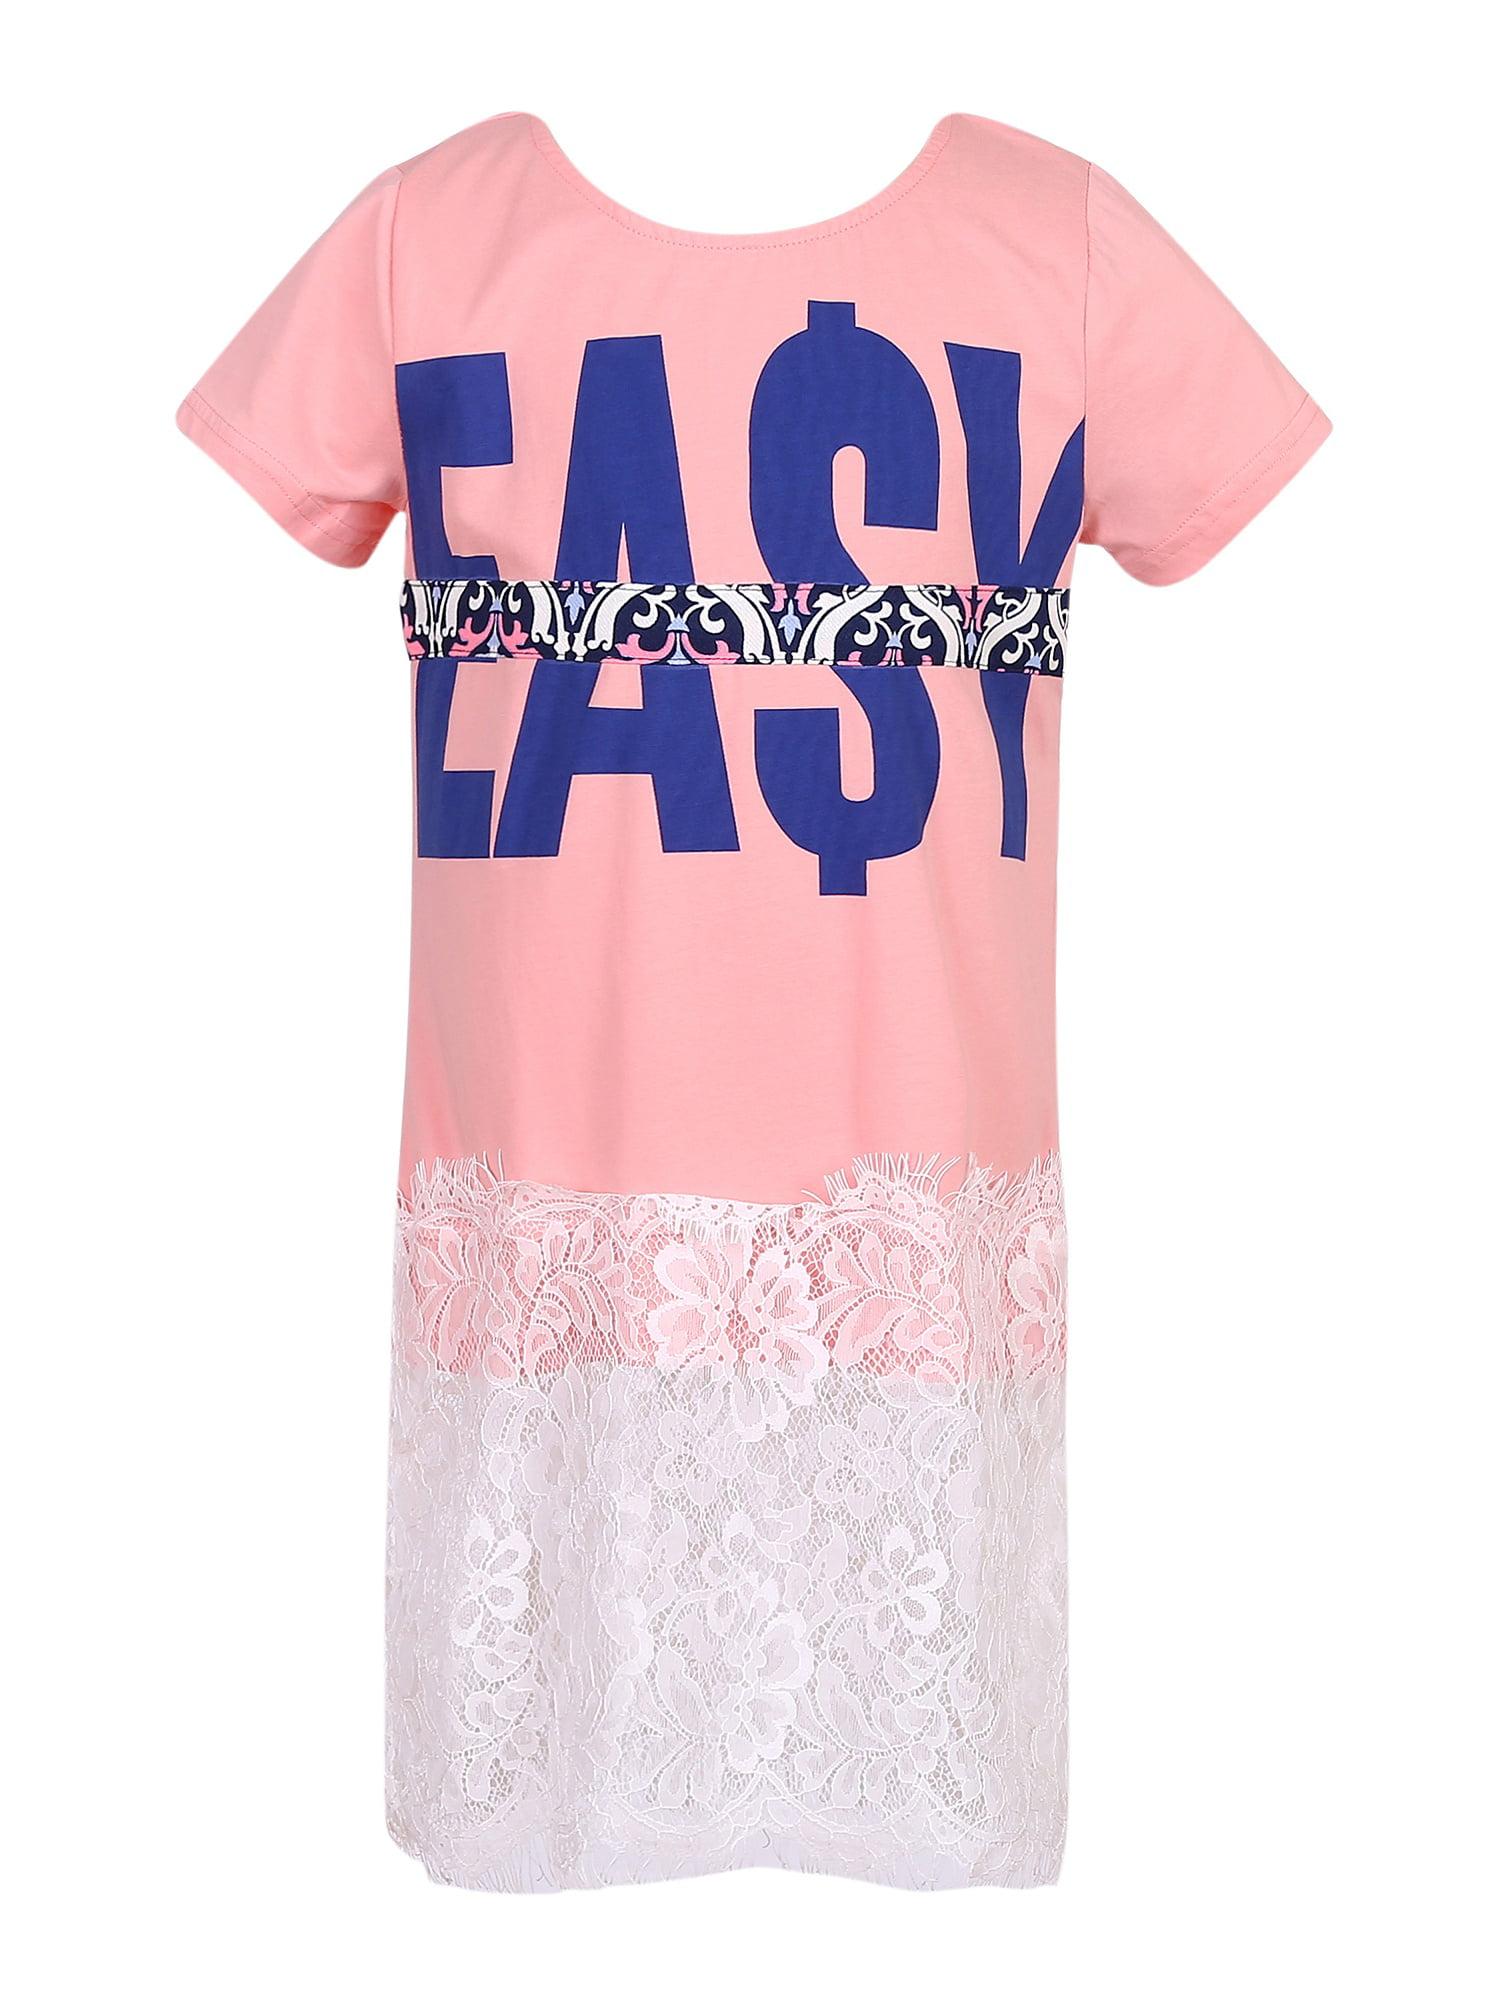 Richie House Girls' Medium Knit T-Shirt with Lace Bottom RH2476